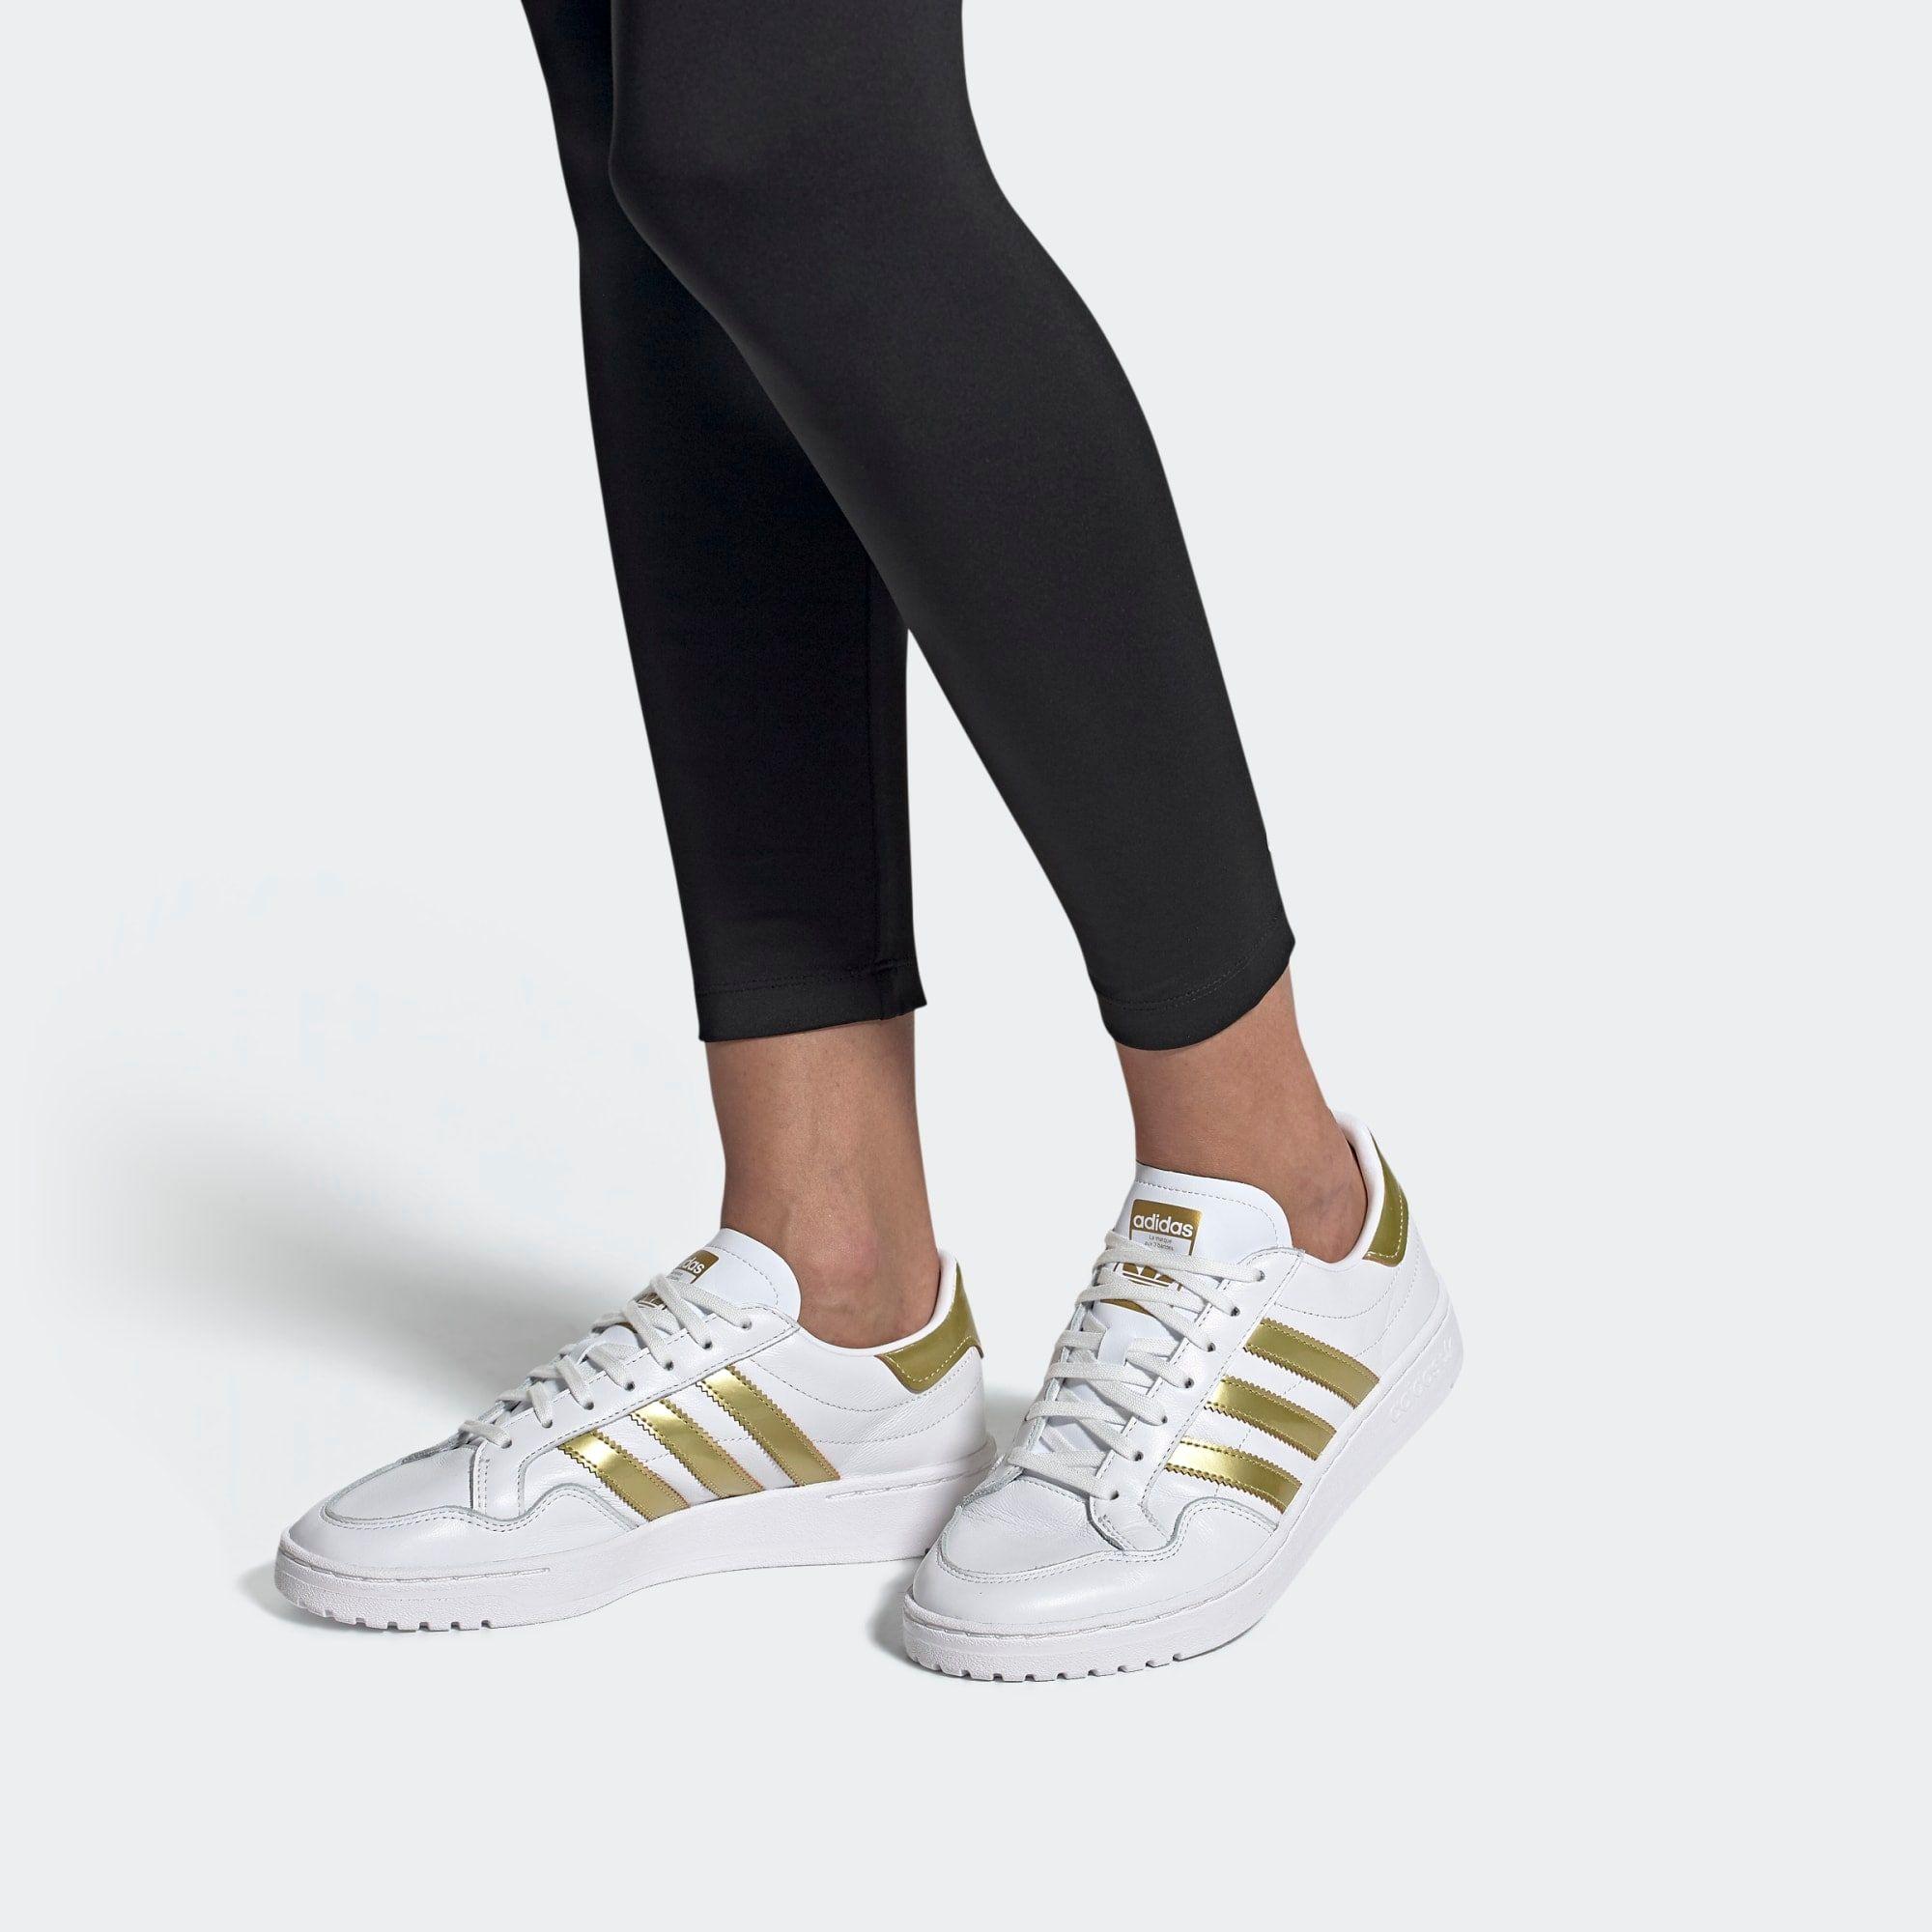 ADIDAS ORIGINALS Sneaker 'Modern court' Damen, Weiß / Gold ...